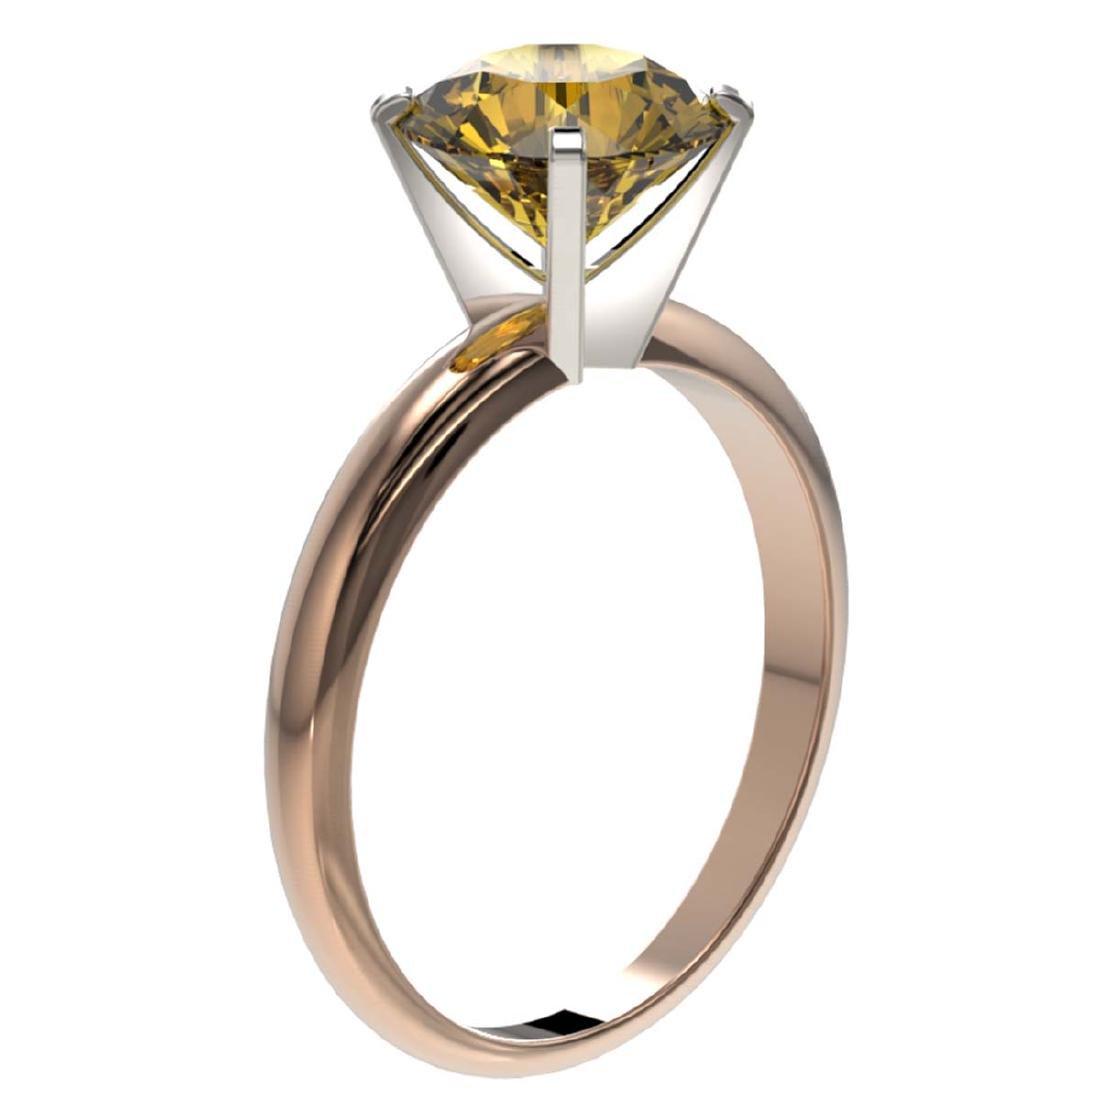 2.50 ctw Intense Yellow SI Diamond Solitaire Ring 10K - 3